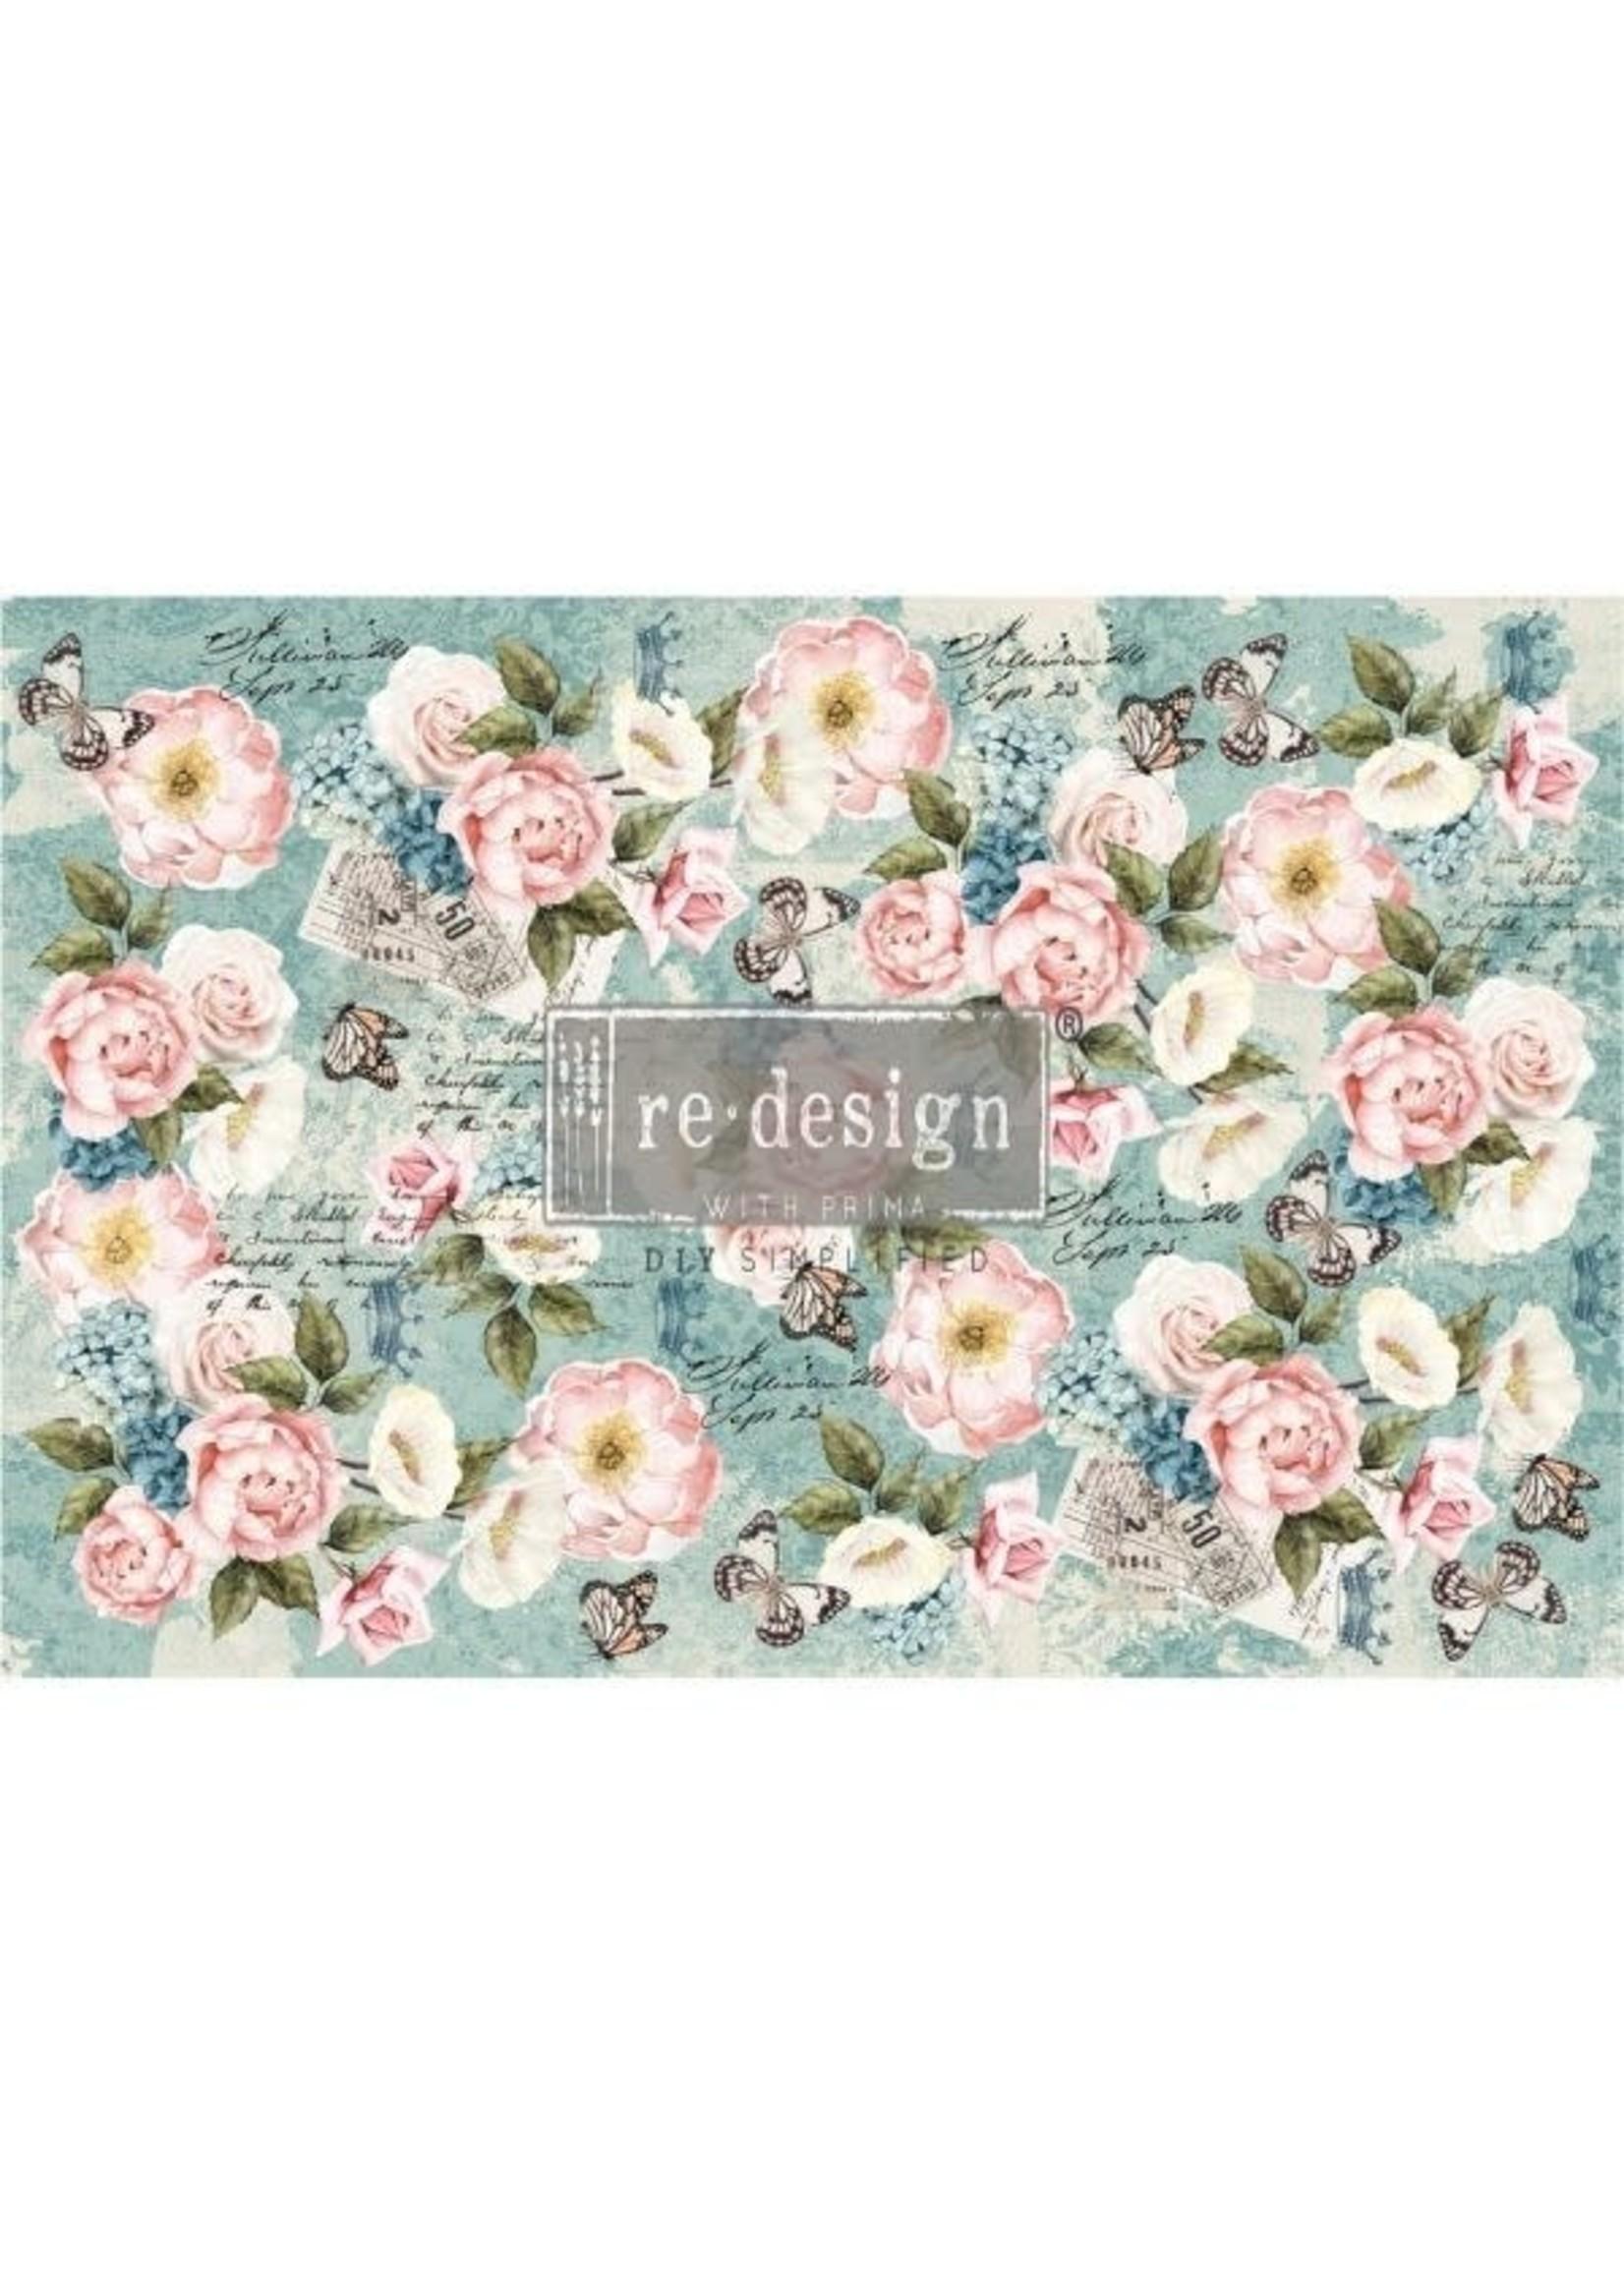 Re-Design with Prima® Zola Re·Design with Prima®  Decoupage Tissue Paper